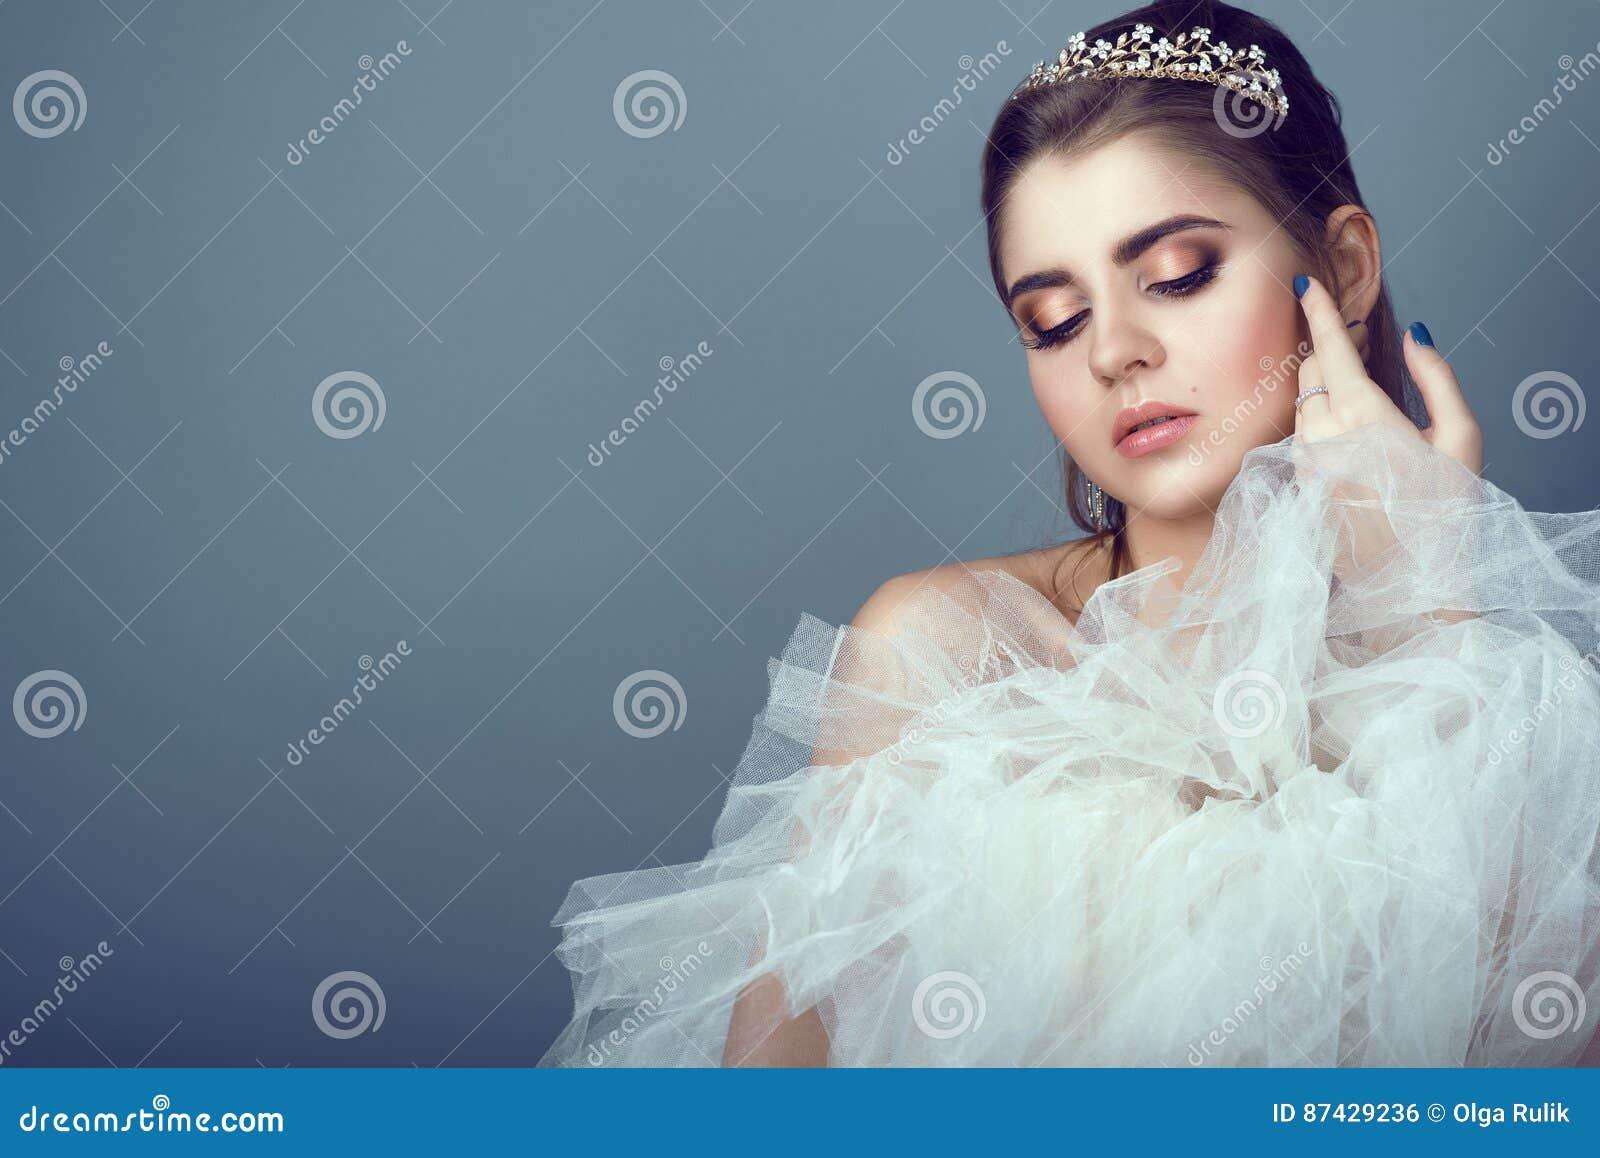 Retrato da noiva bonita nova no diadema que pressiona a saia macia de seu vestido de casamento a seu peito